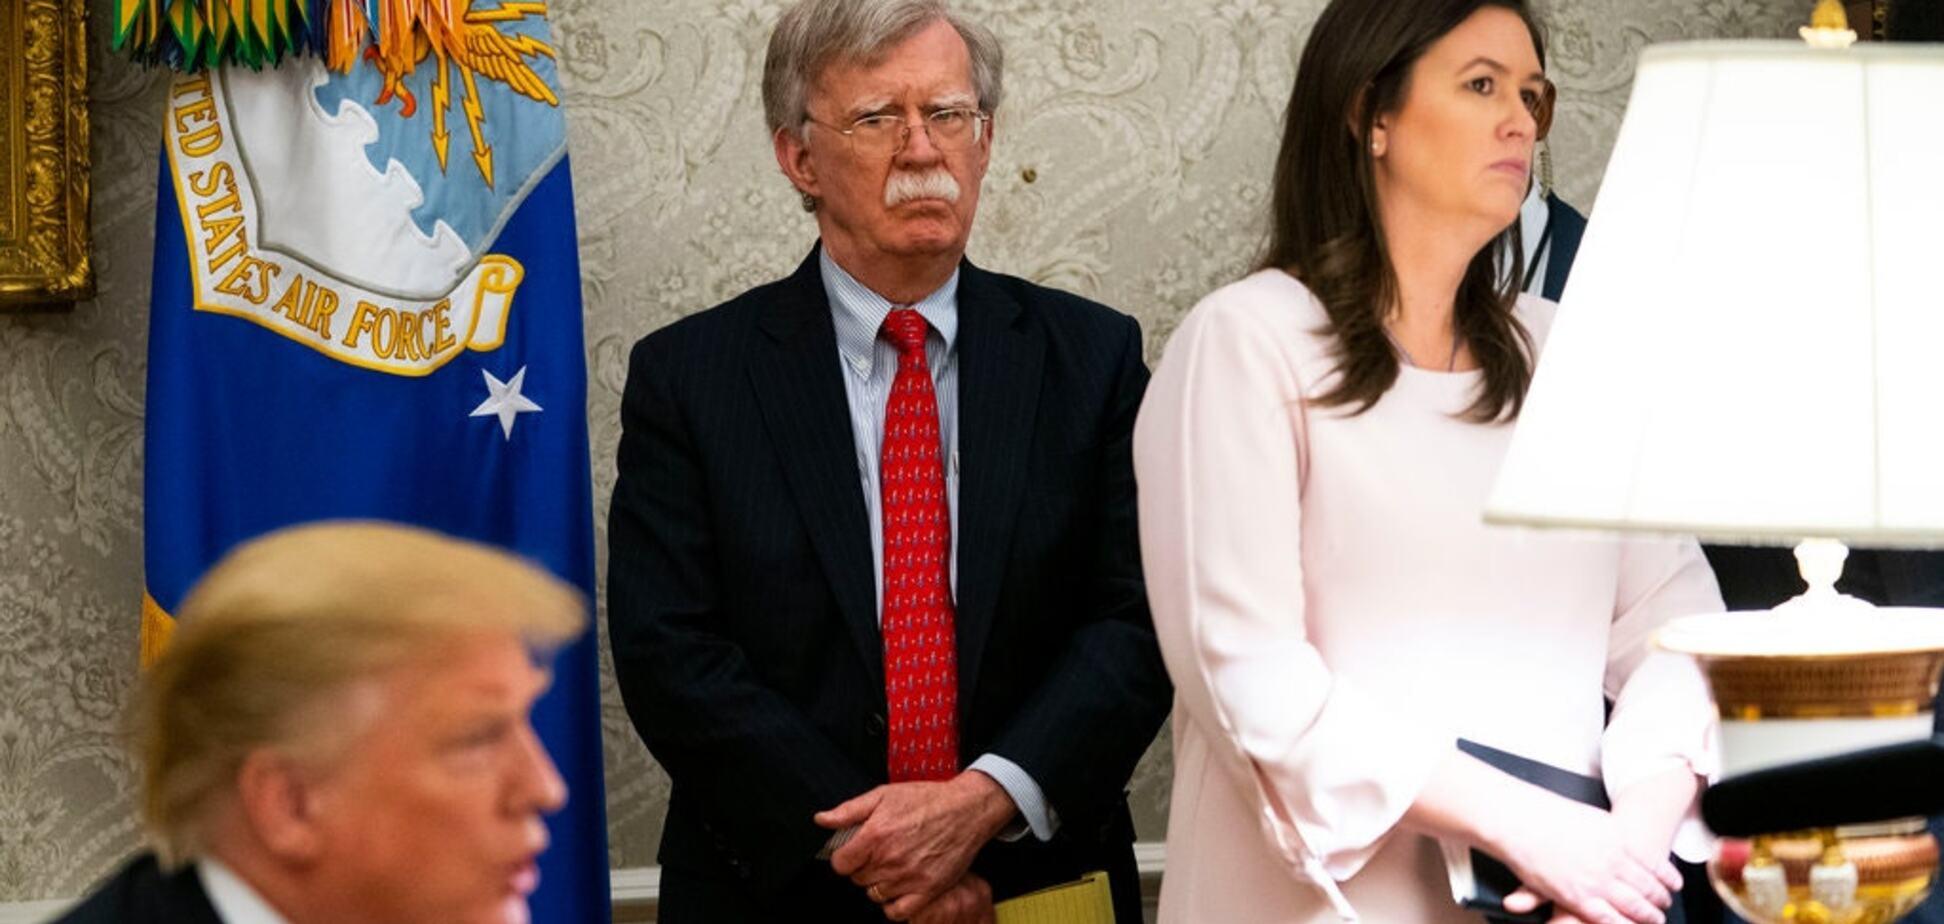 Трамп давил на Украину ради компромата на соперников